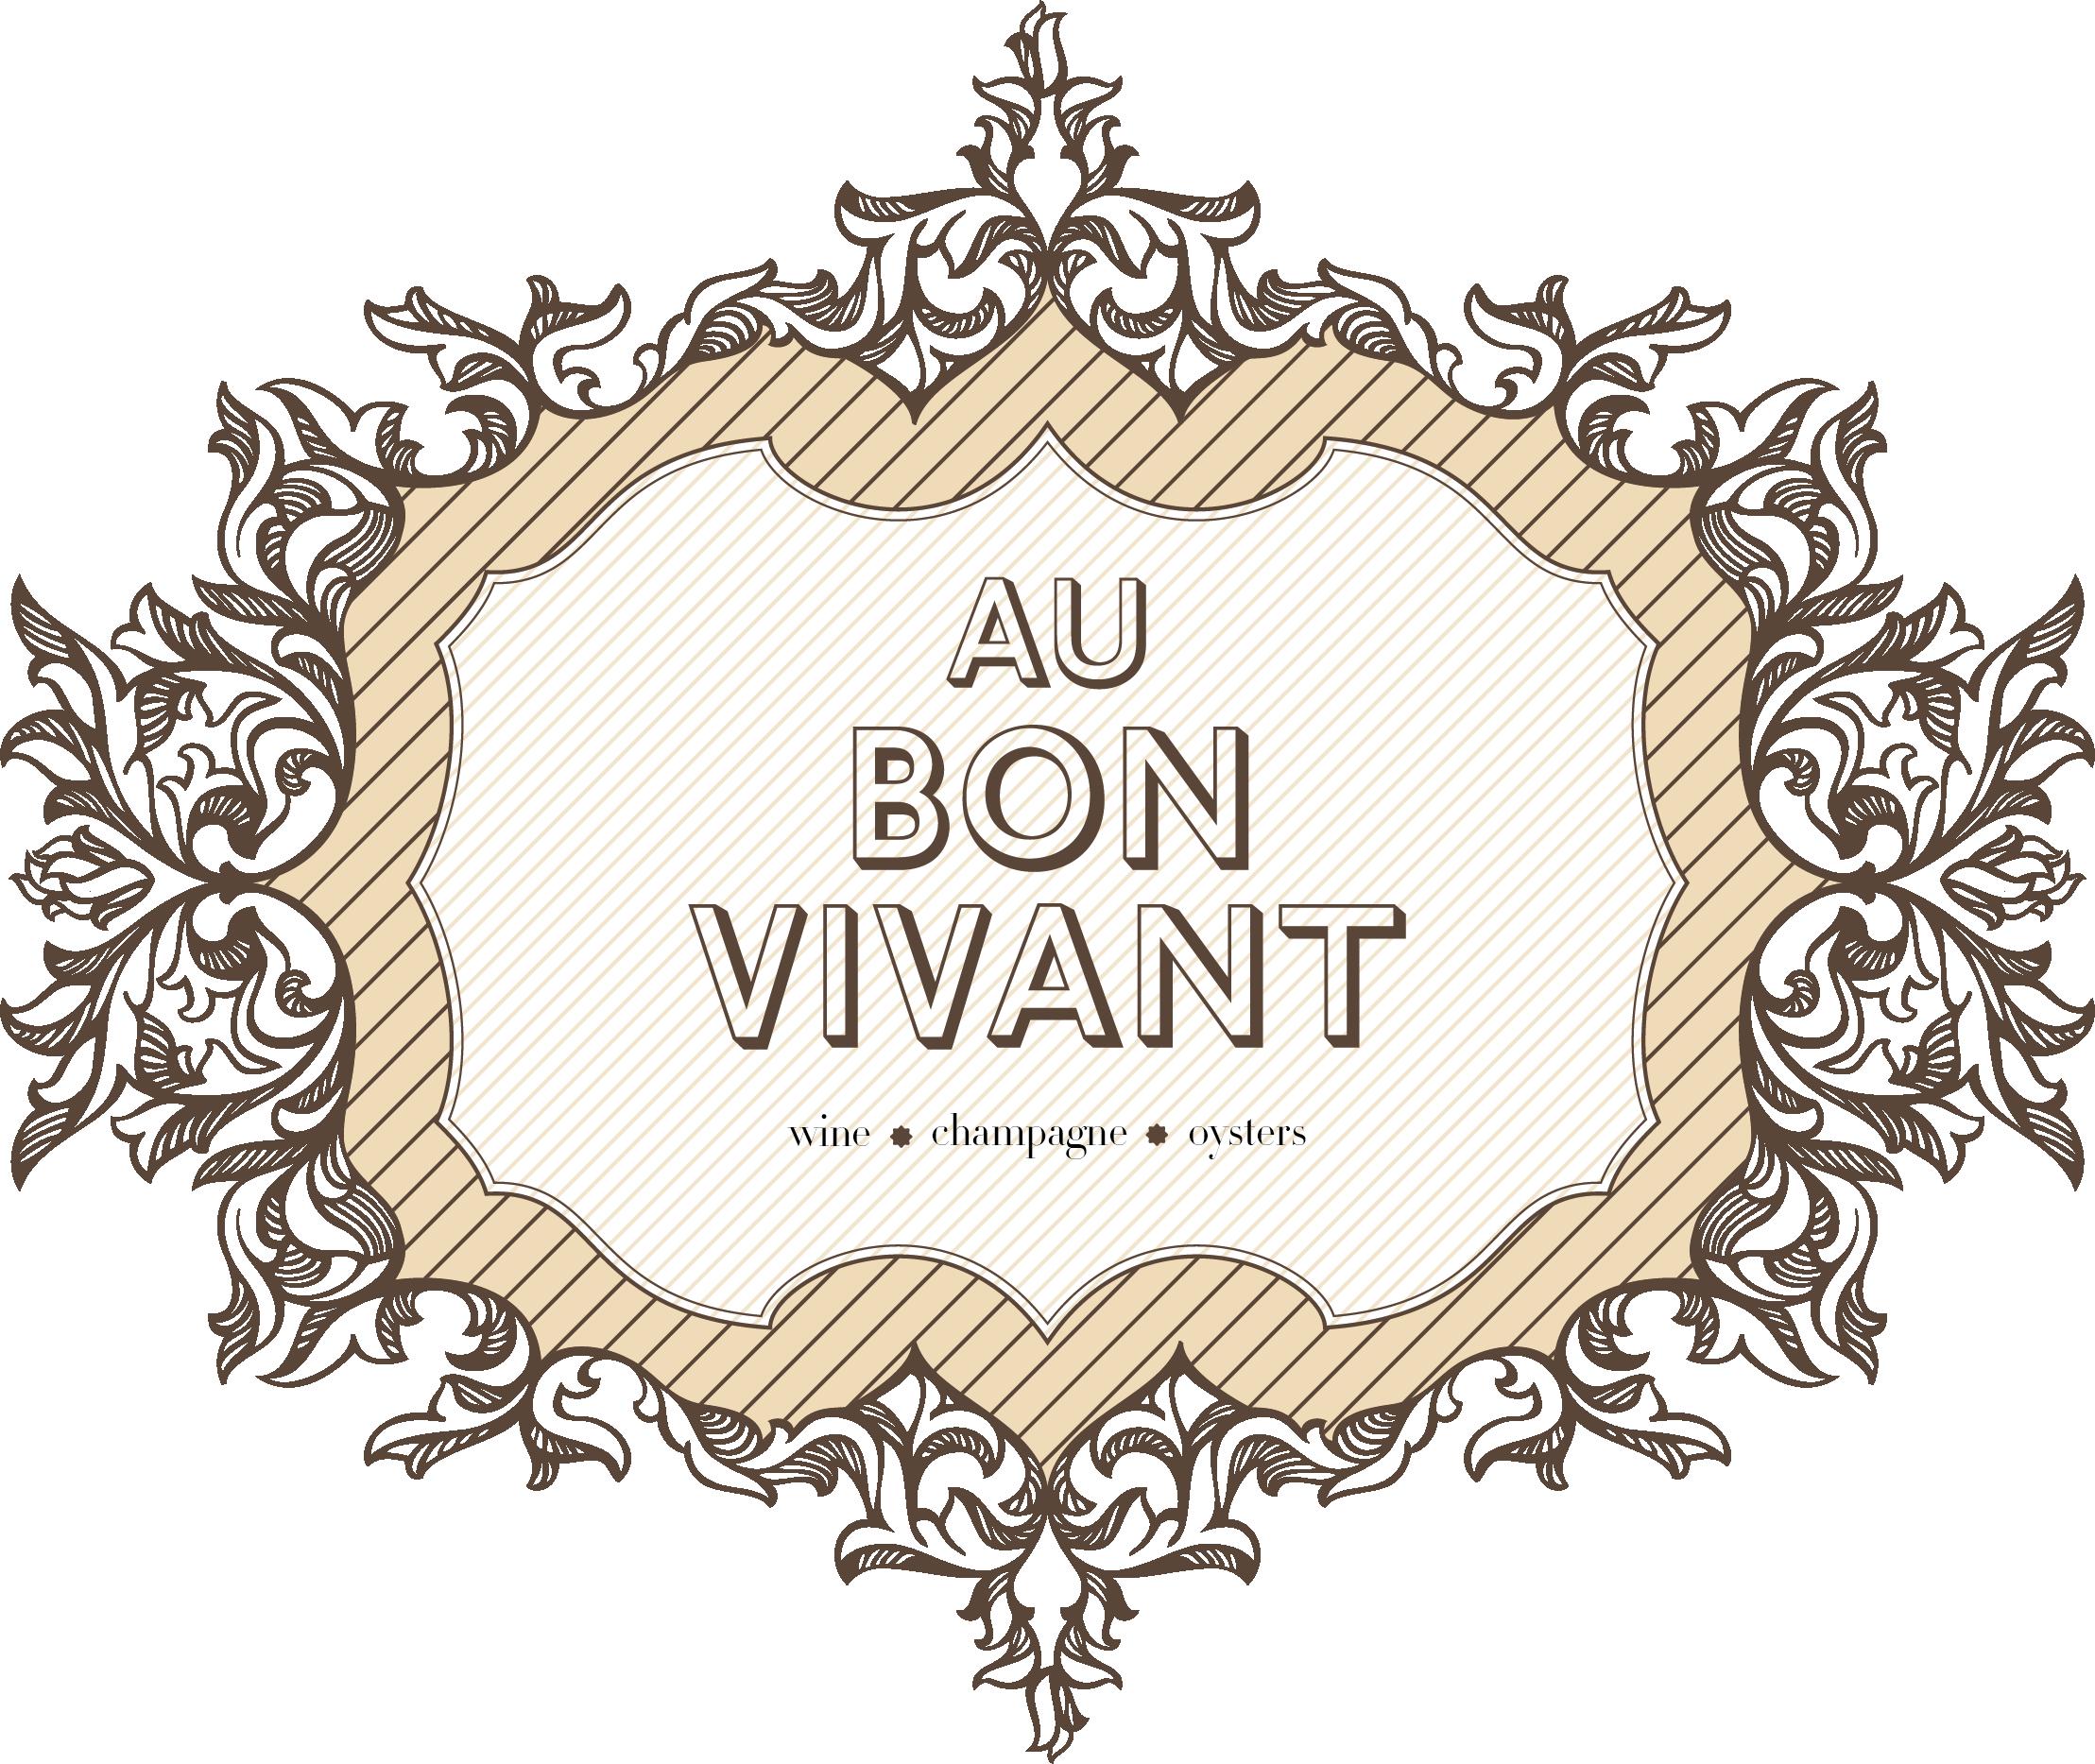 Au Bon Vivant